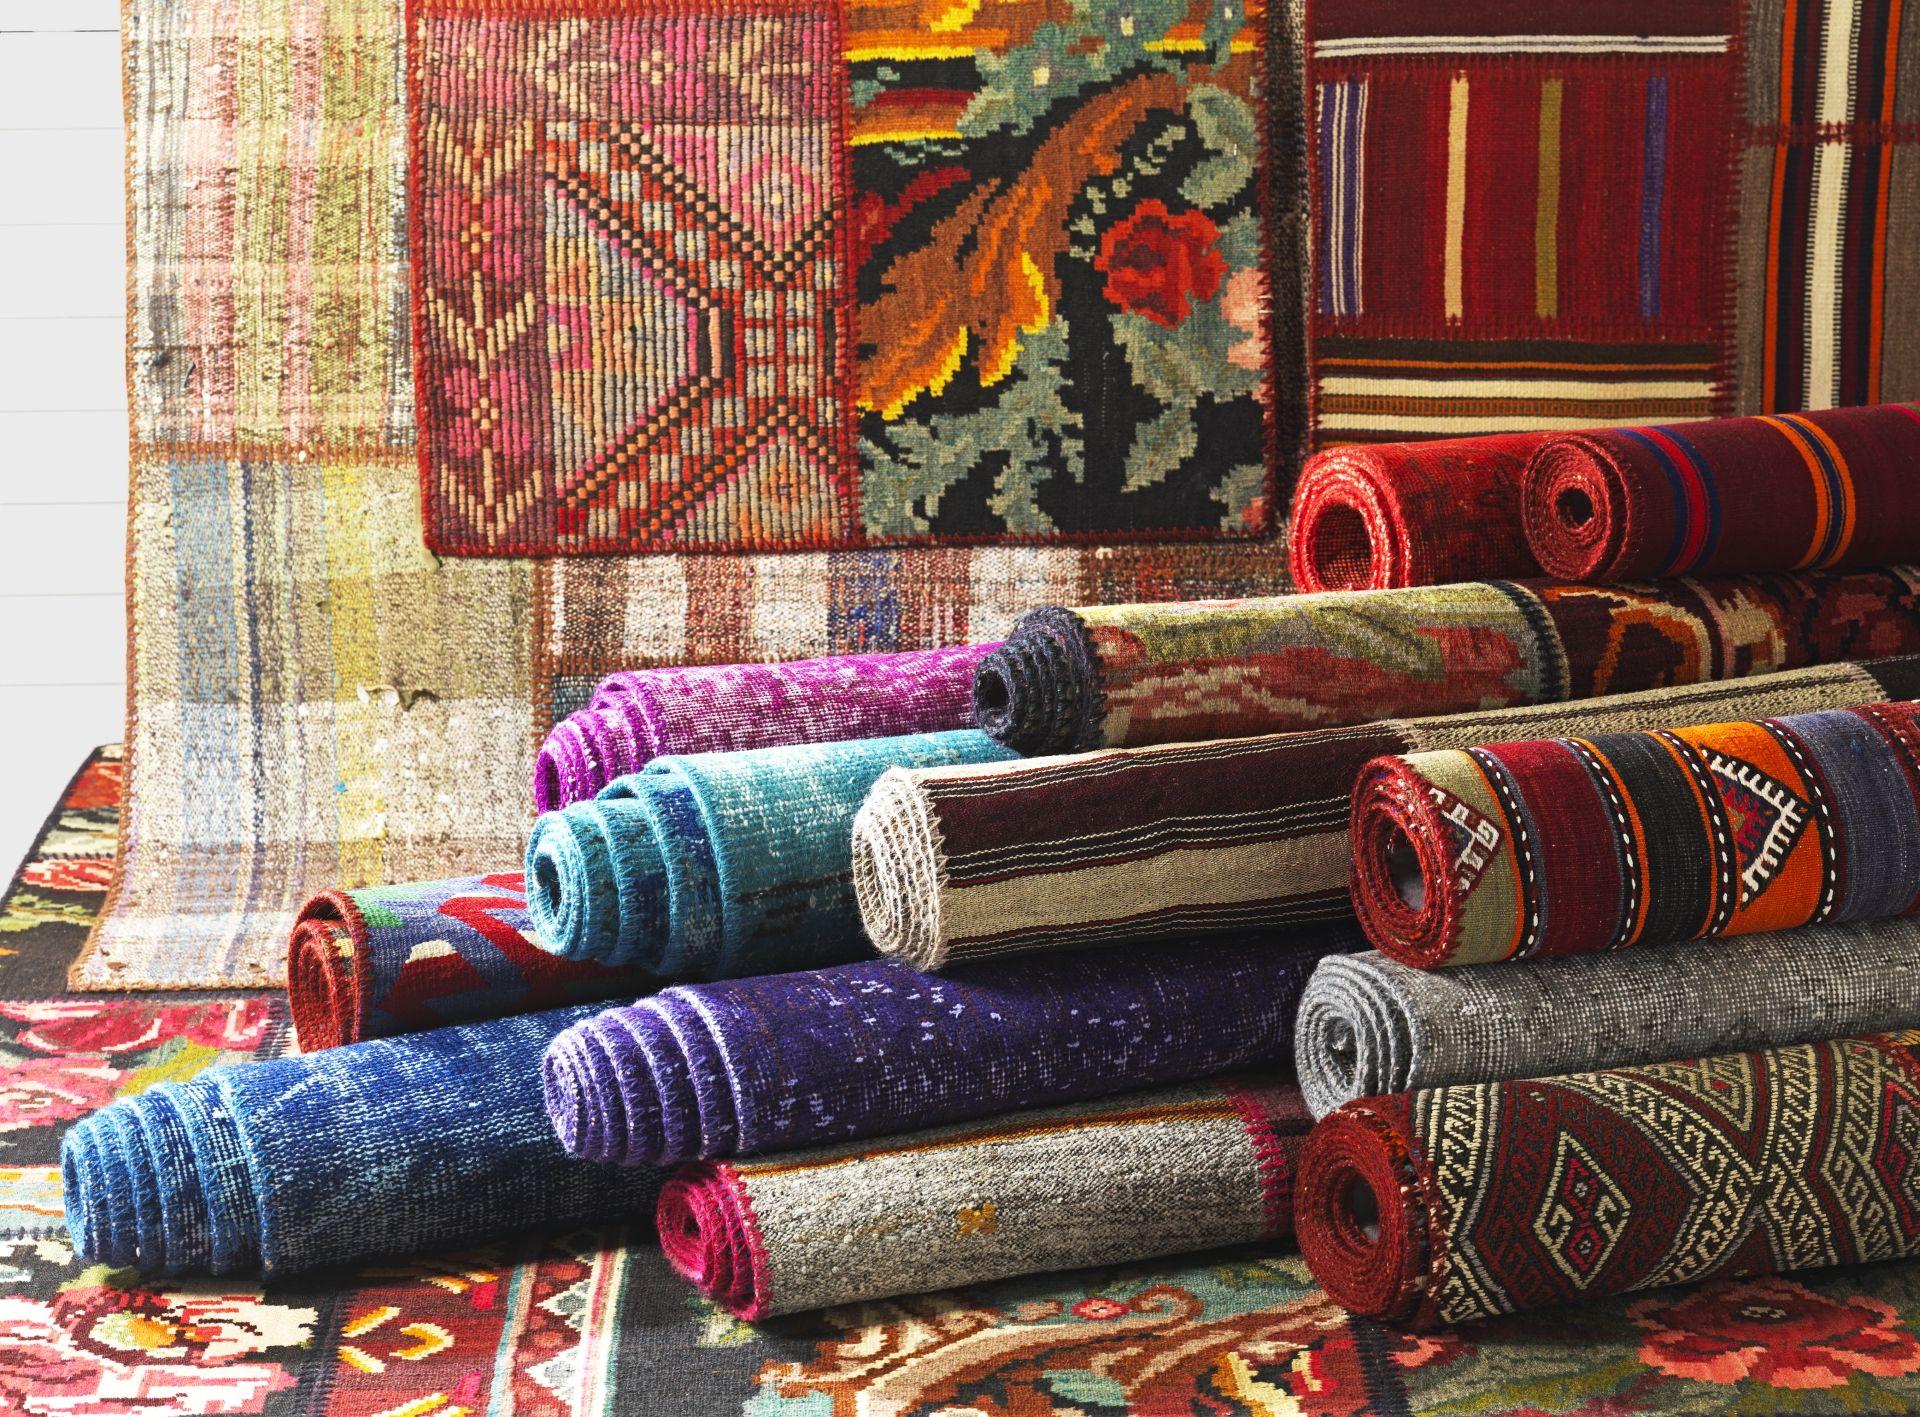 Perzisch Tapijt Ikea : Silkeborg vloerkleed ikea ikeanederland ikeanl designdroom